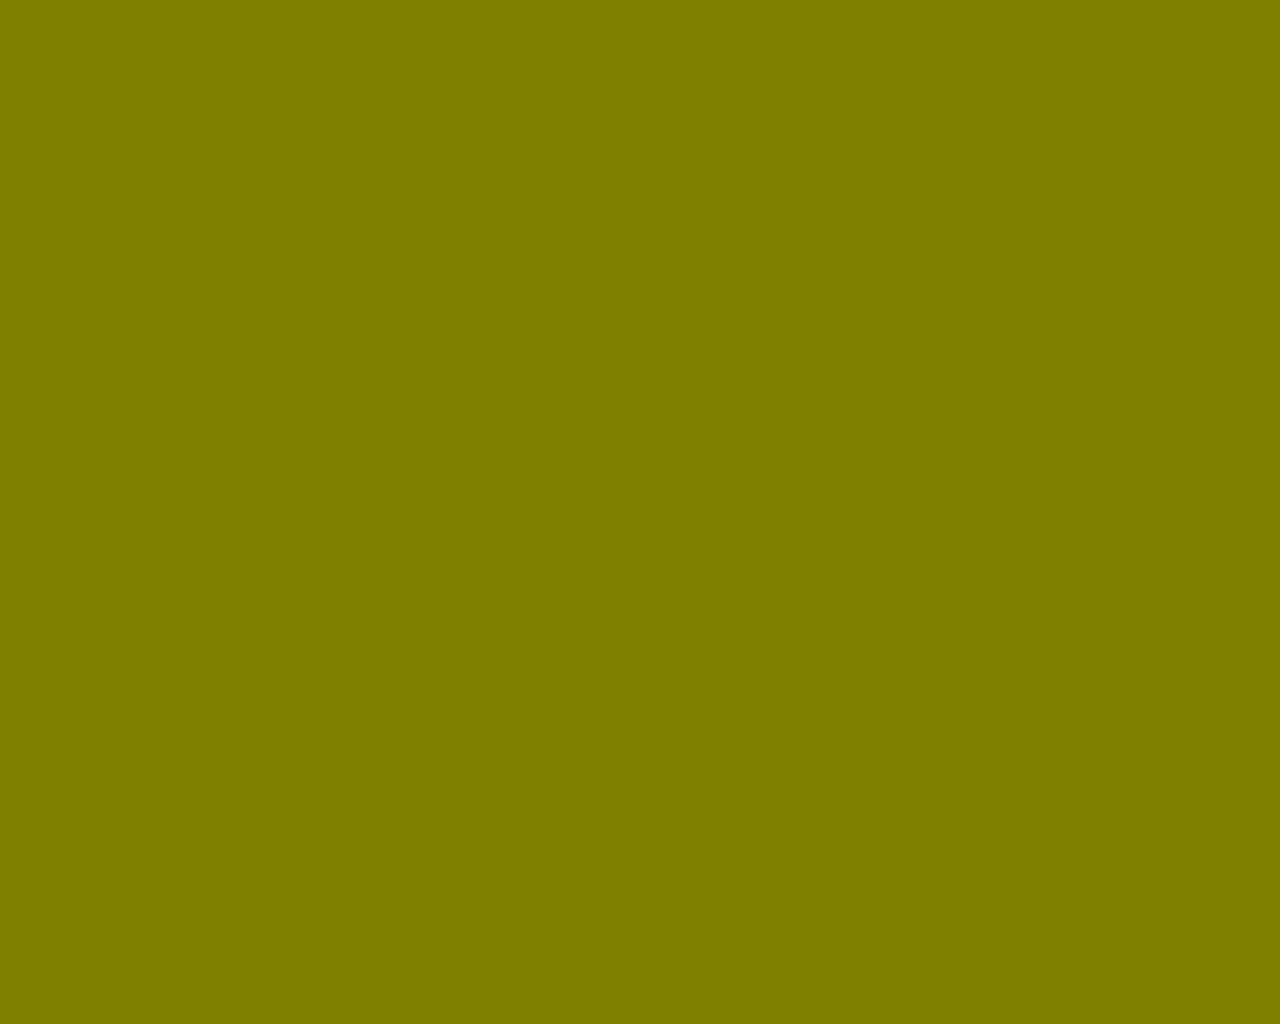 1280x1024 Olive Solid Color Background